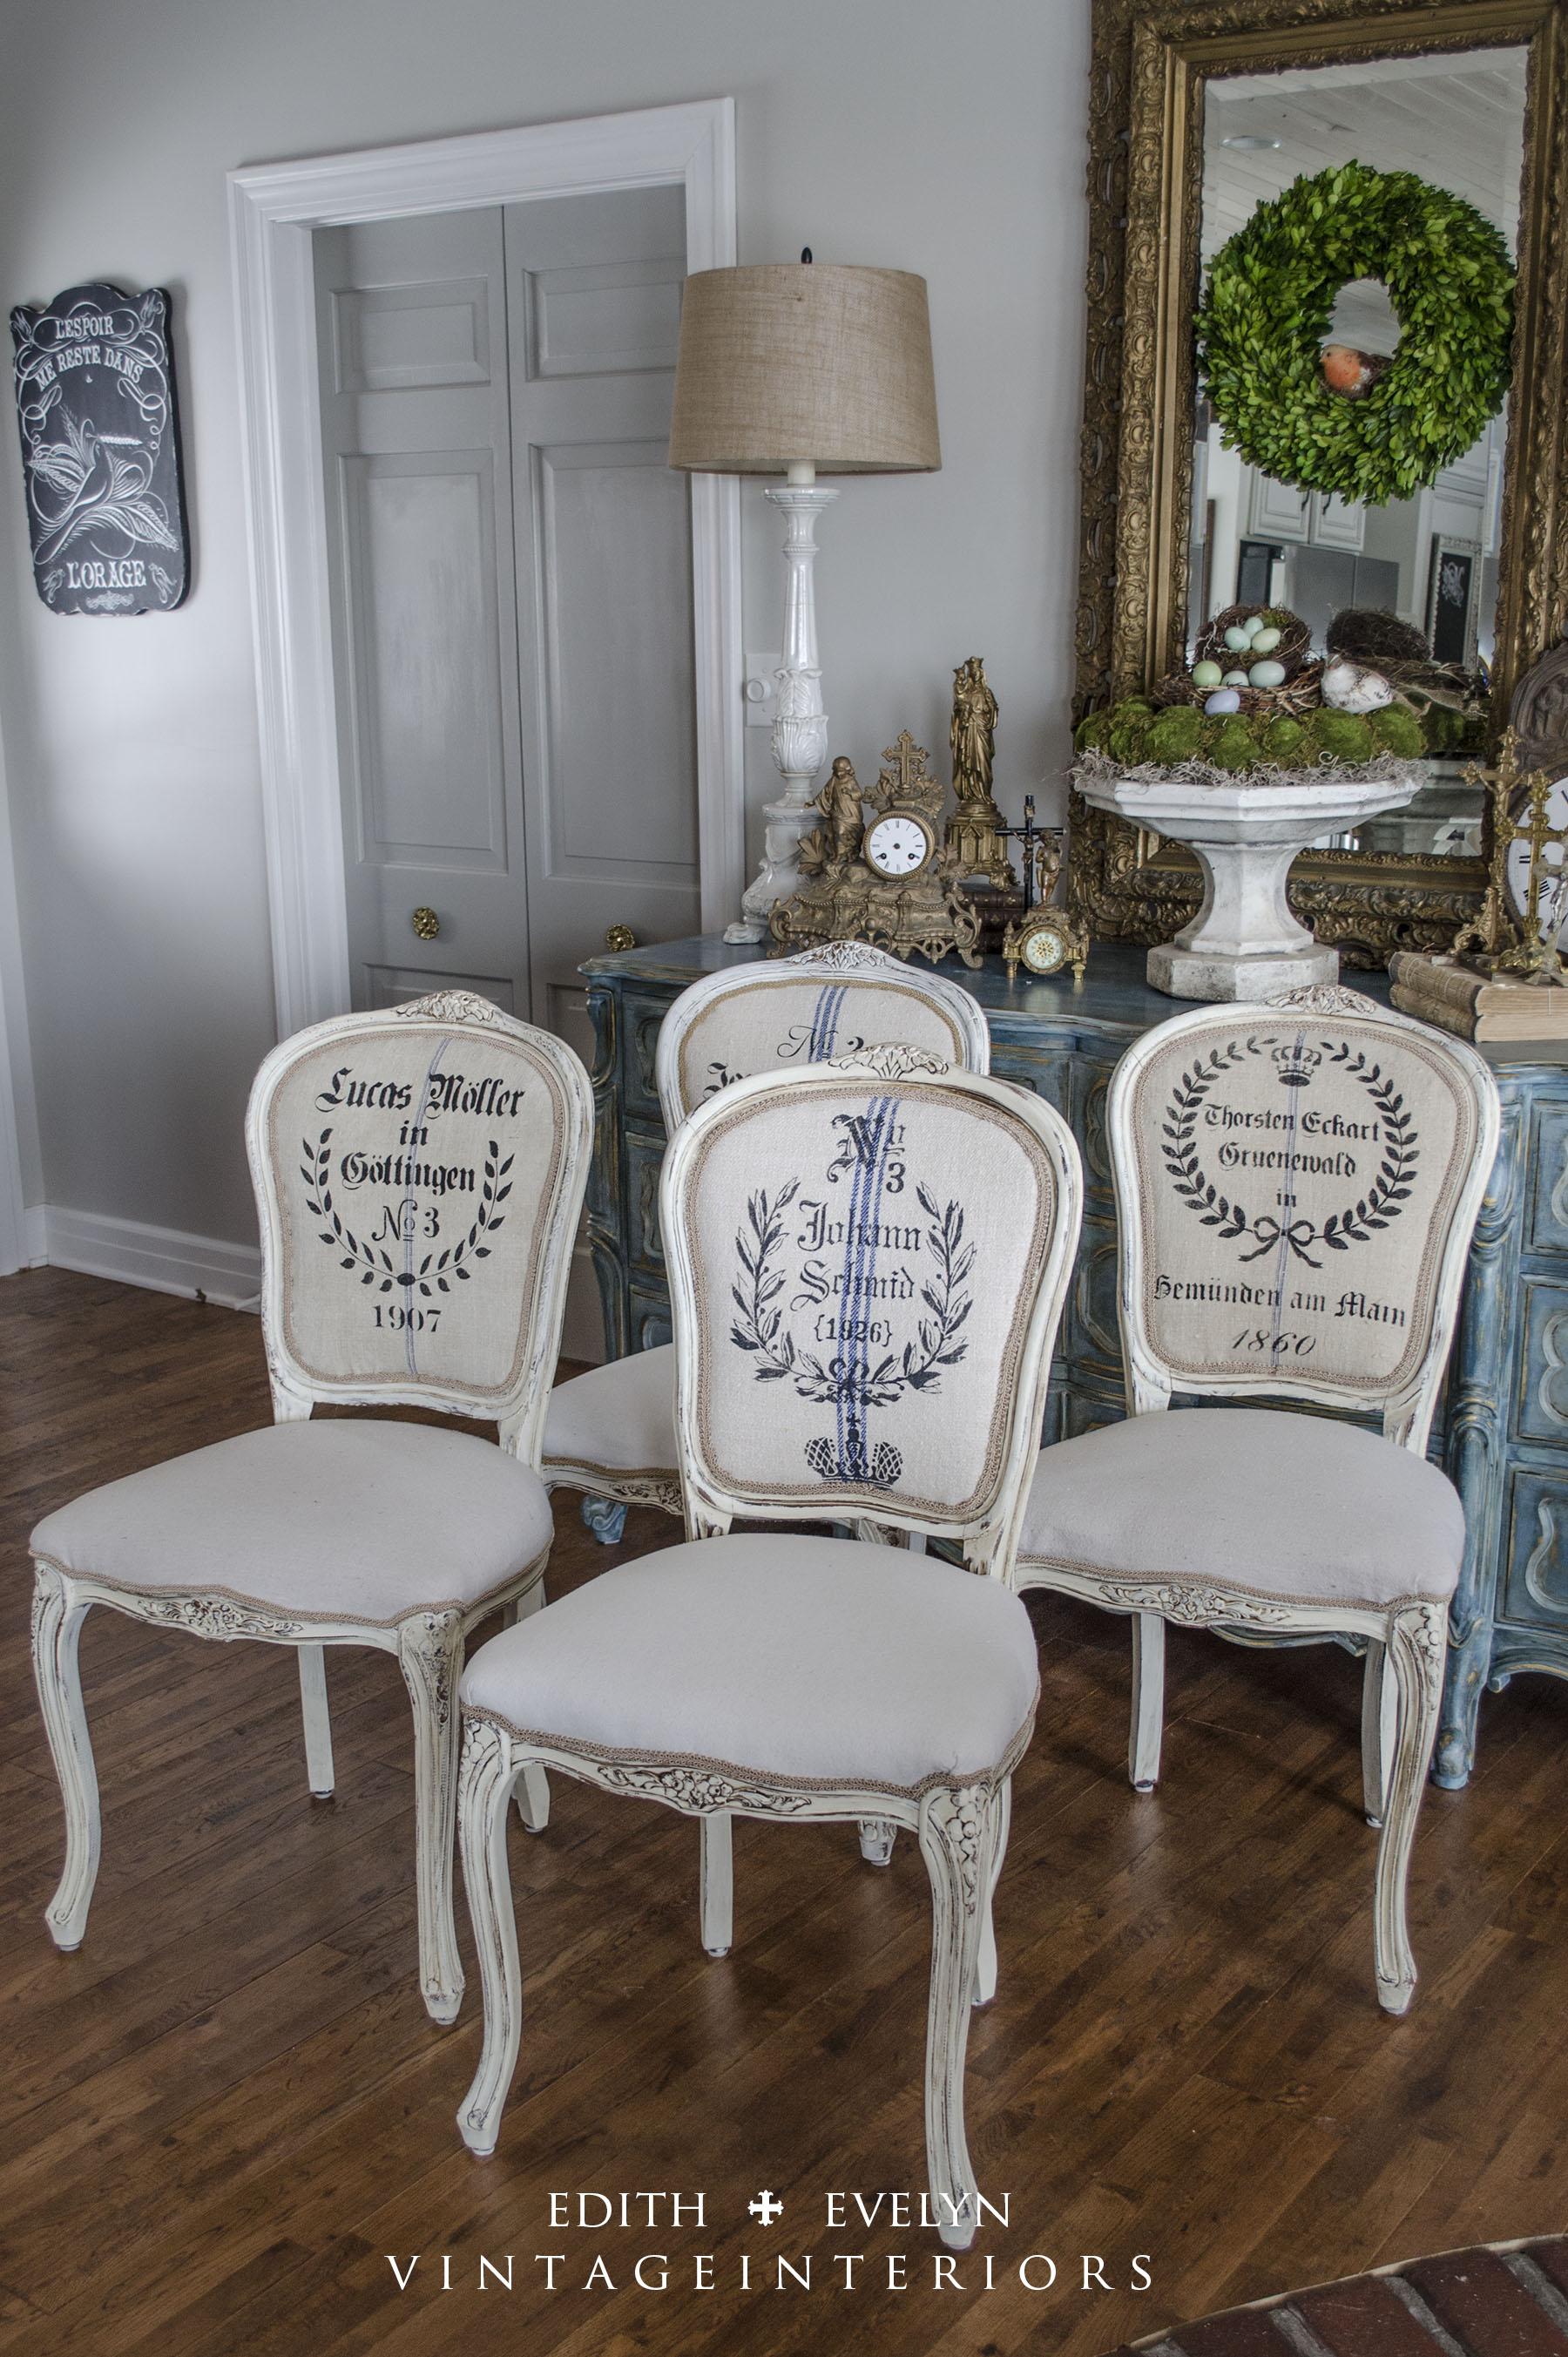 furniture projects edith evelyn vintage. Black Bedroom Furniture Sets. Home Design Ideas